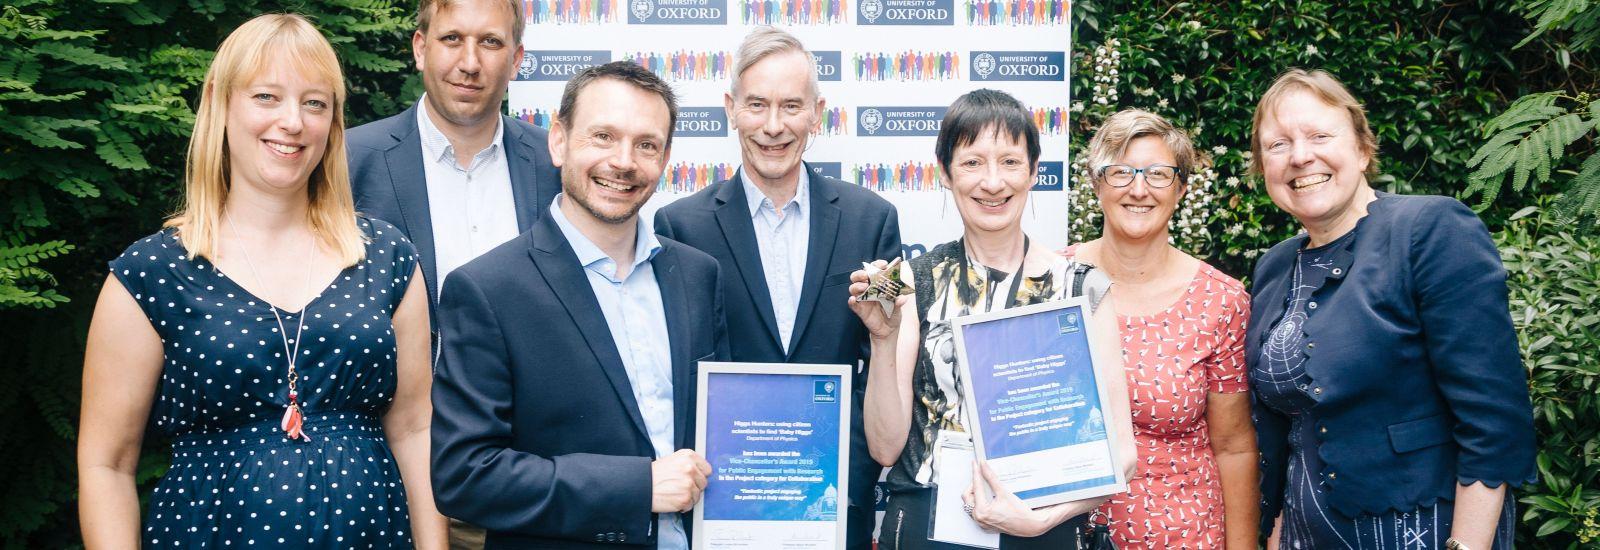 Group photo of VC PER Award winners